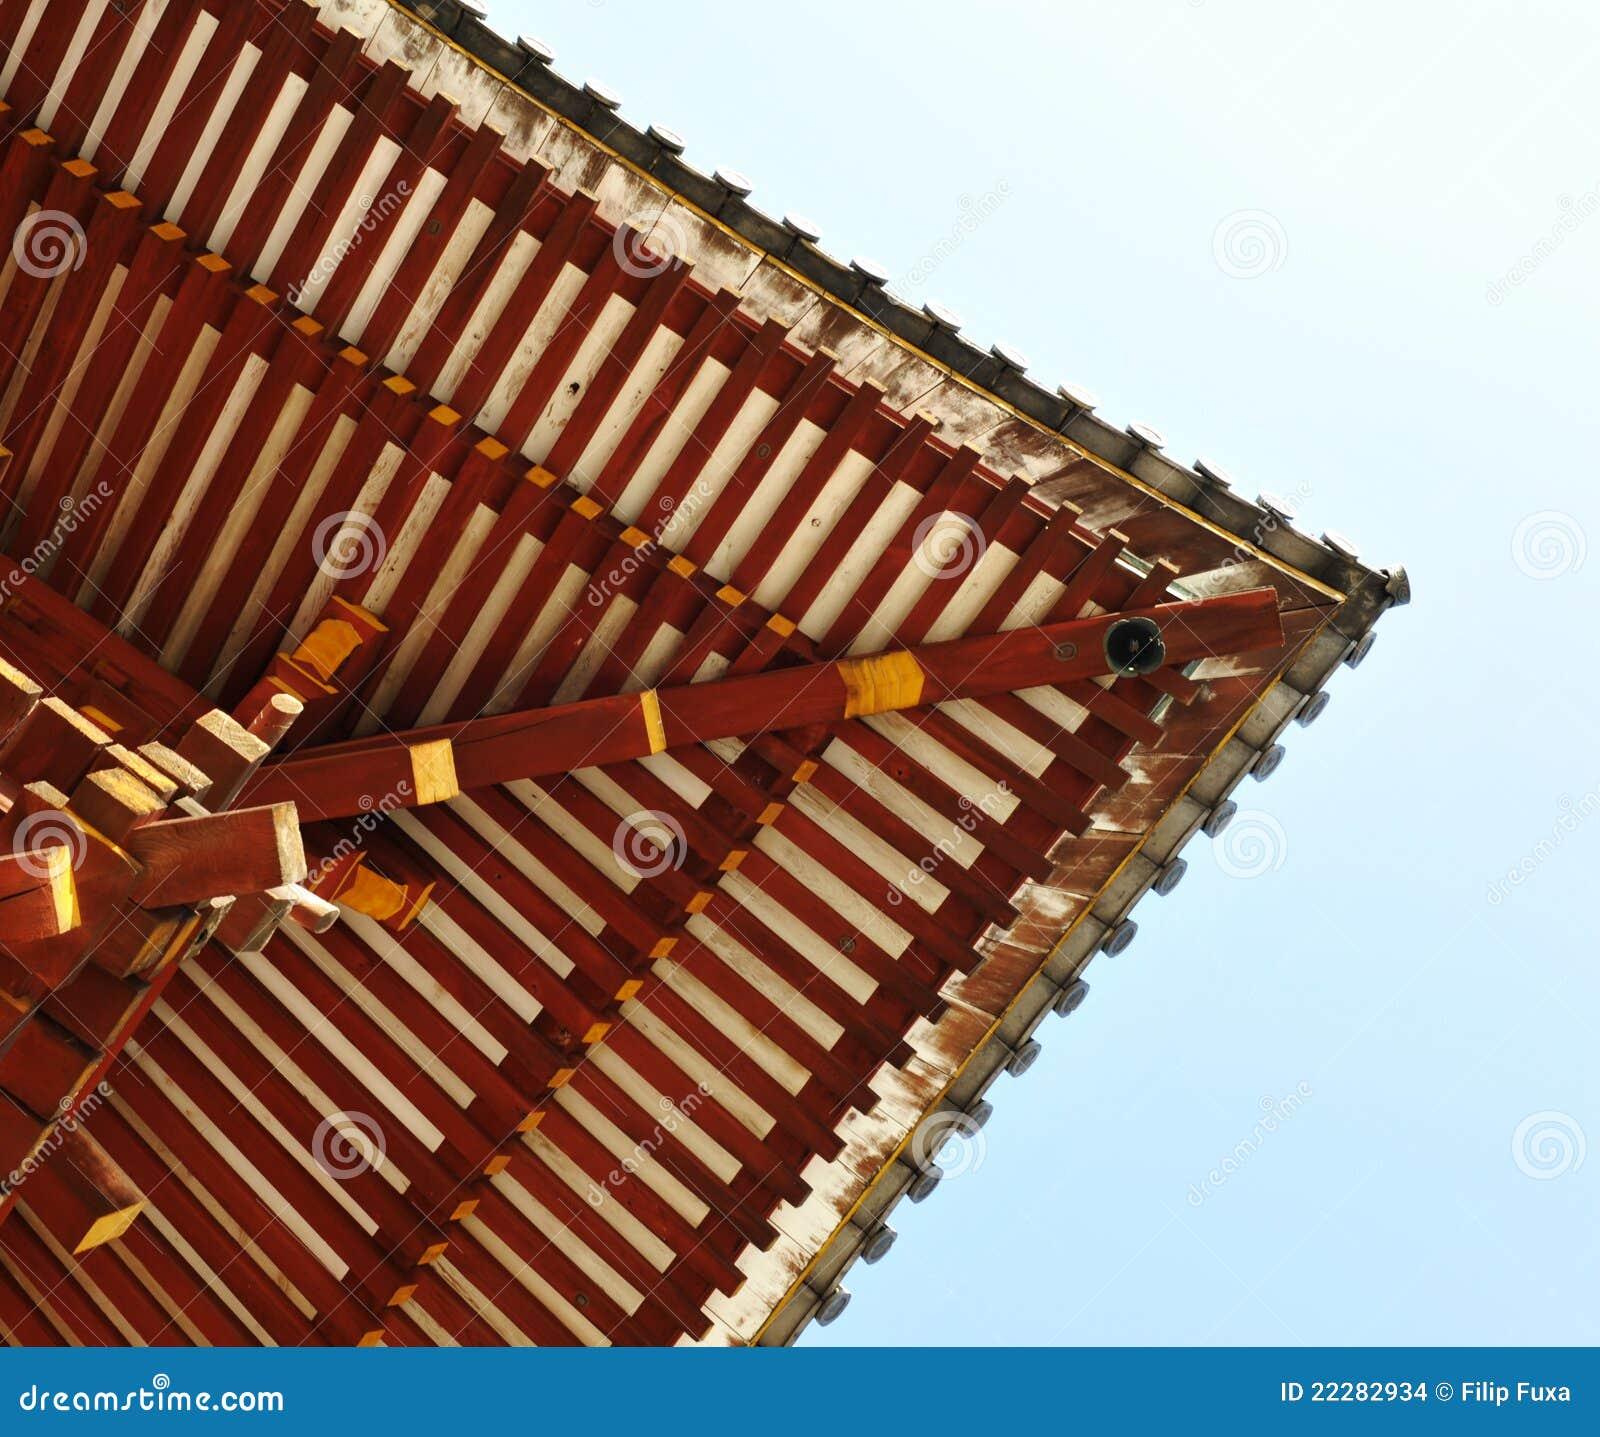 Japanisches Dach japanisches dach stockfoto bild bügel holz feld 22282934